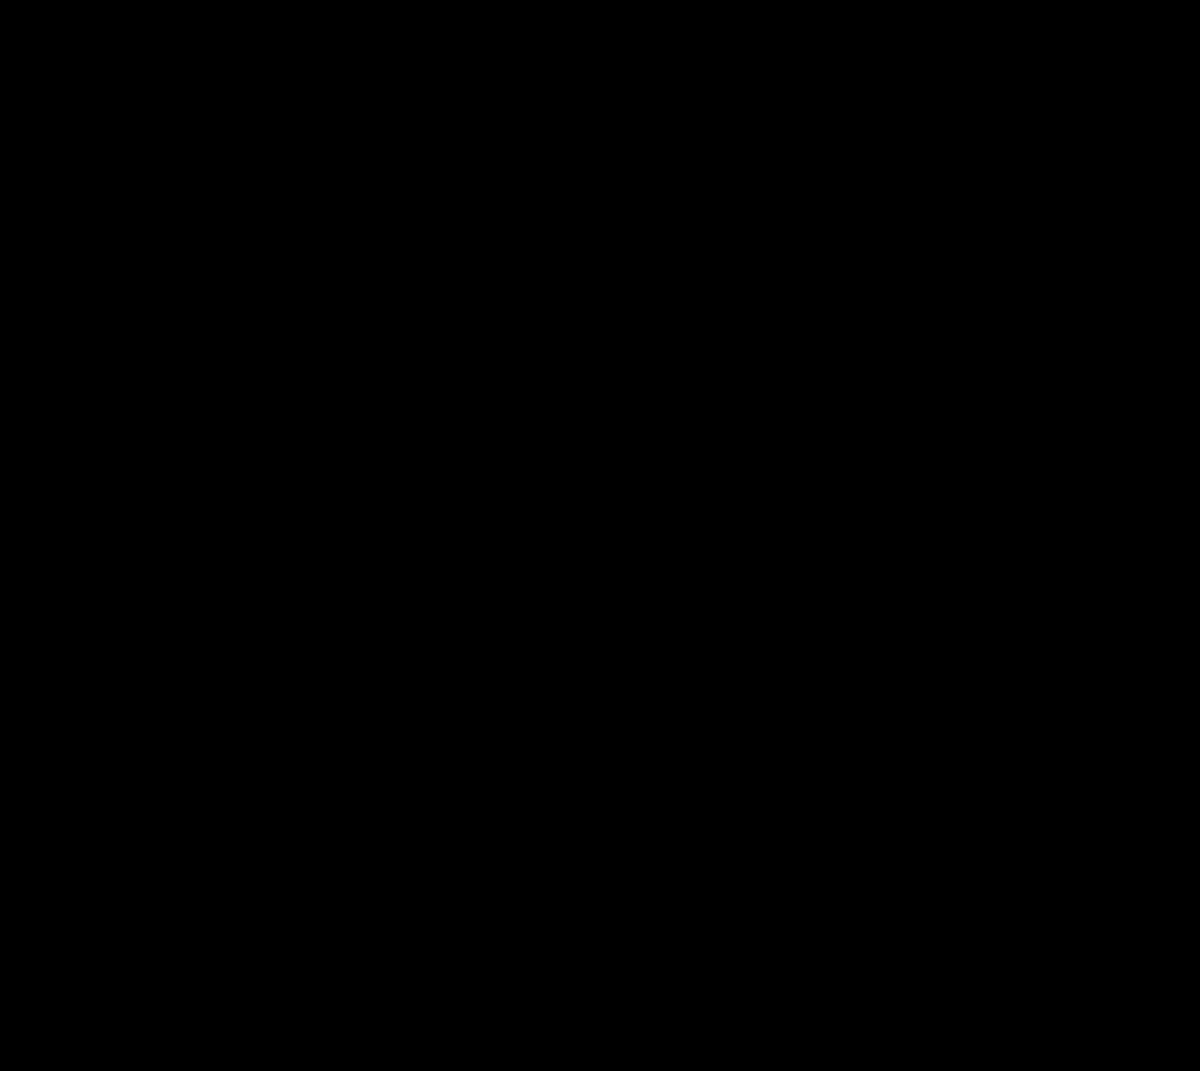 Entreprenör_symbol v2.png